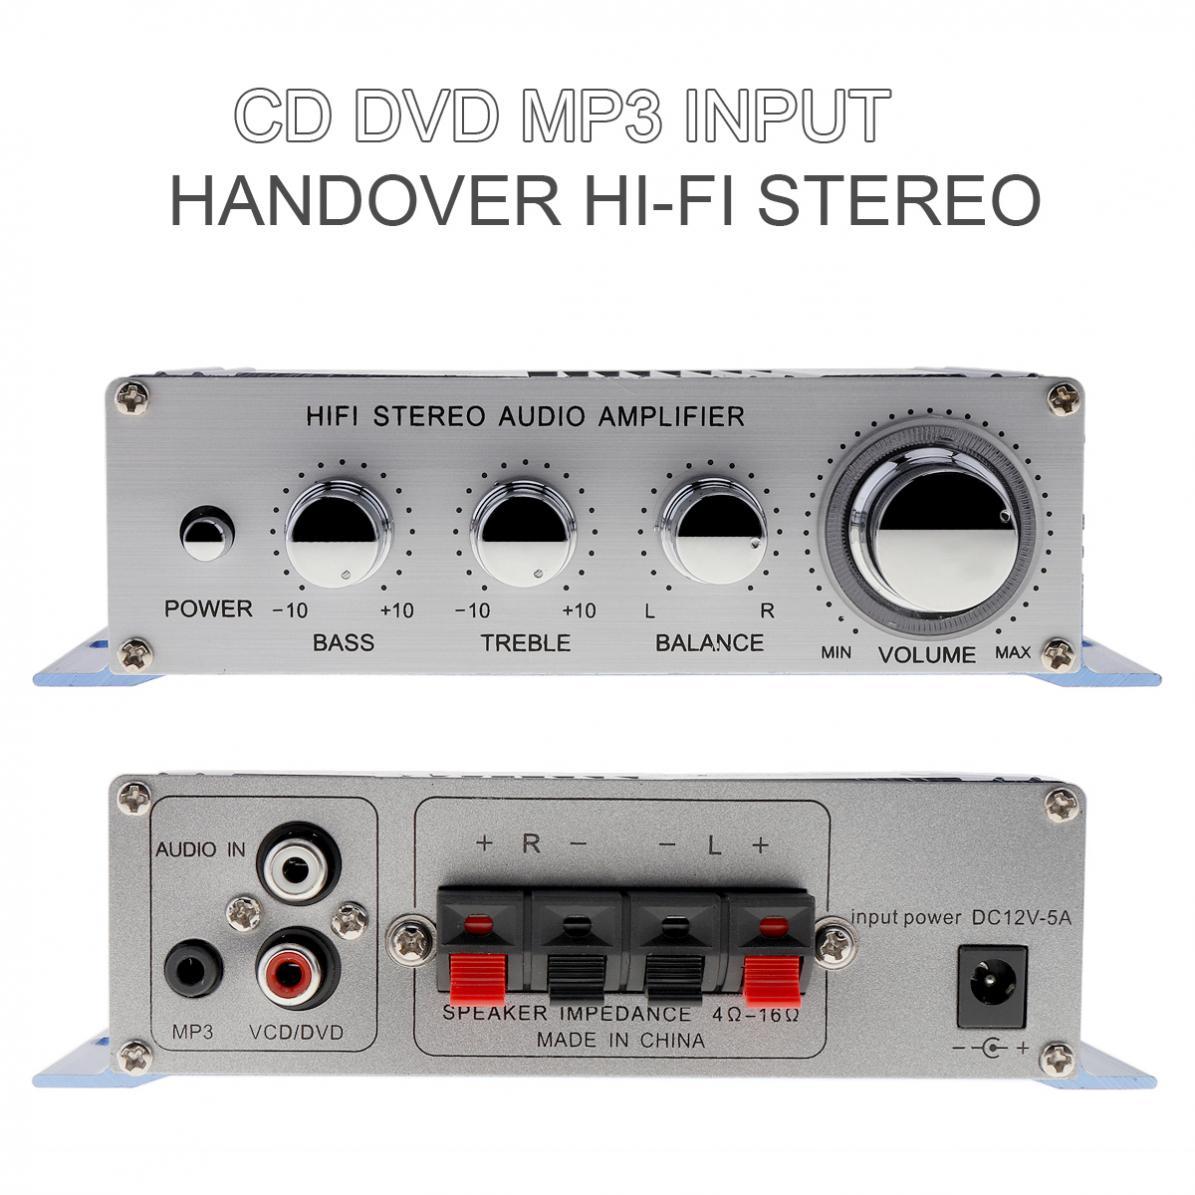 Kentiger 2 Kanäle 12 V CD/DVD/Mp3-eingang Hallo-fi Stereo Audio Bass Auto Lautsprecher Verstärker Subwoofer RMS 20 Watt + 10 Watt